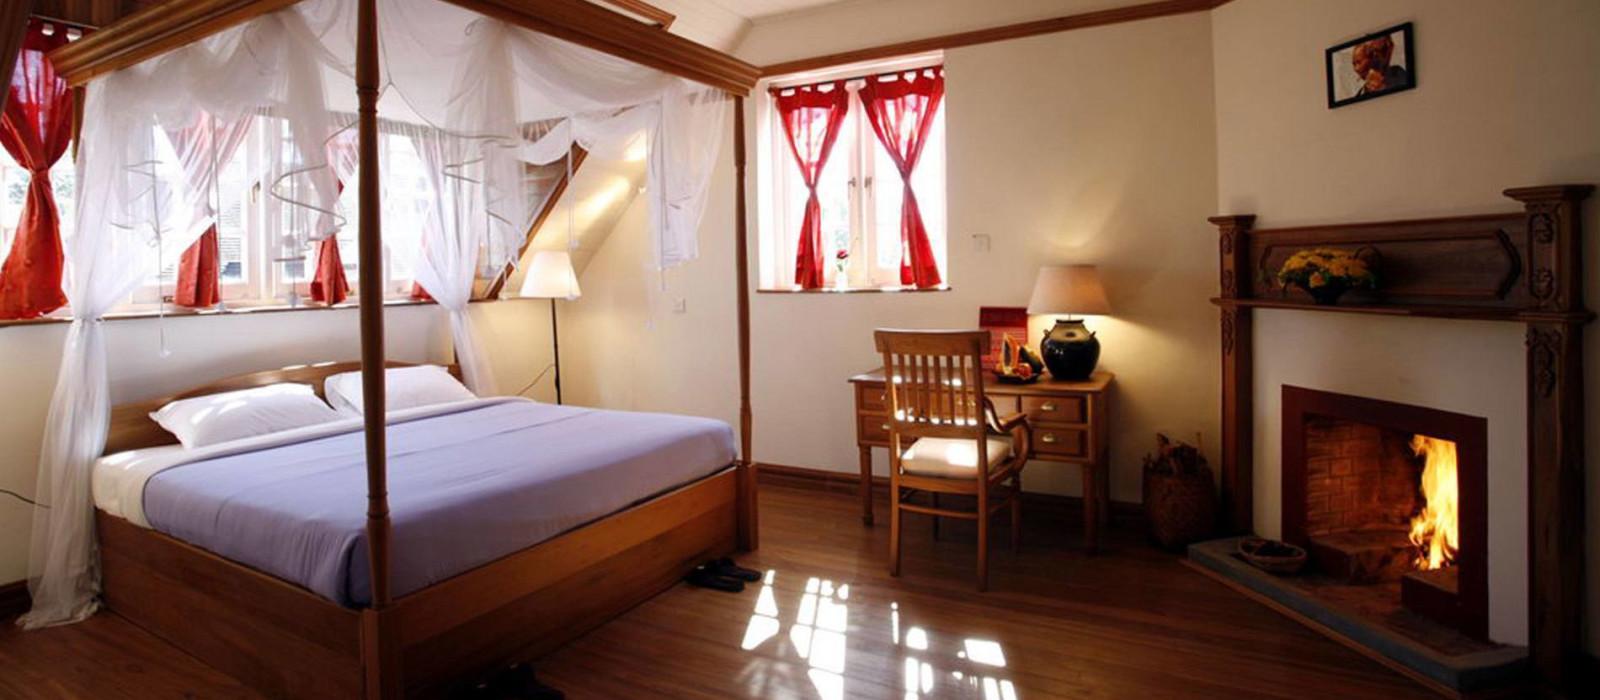 Hotel Amara Resort (Kalaw) Myanmar